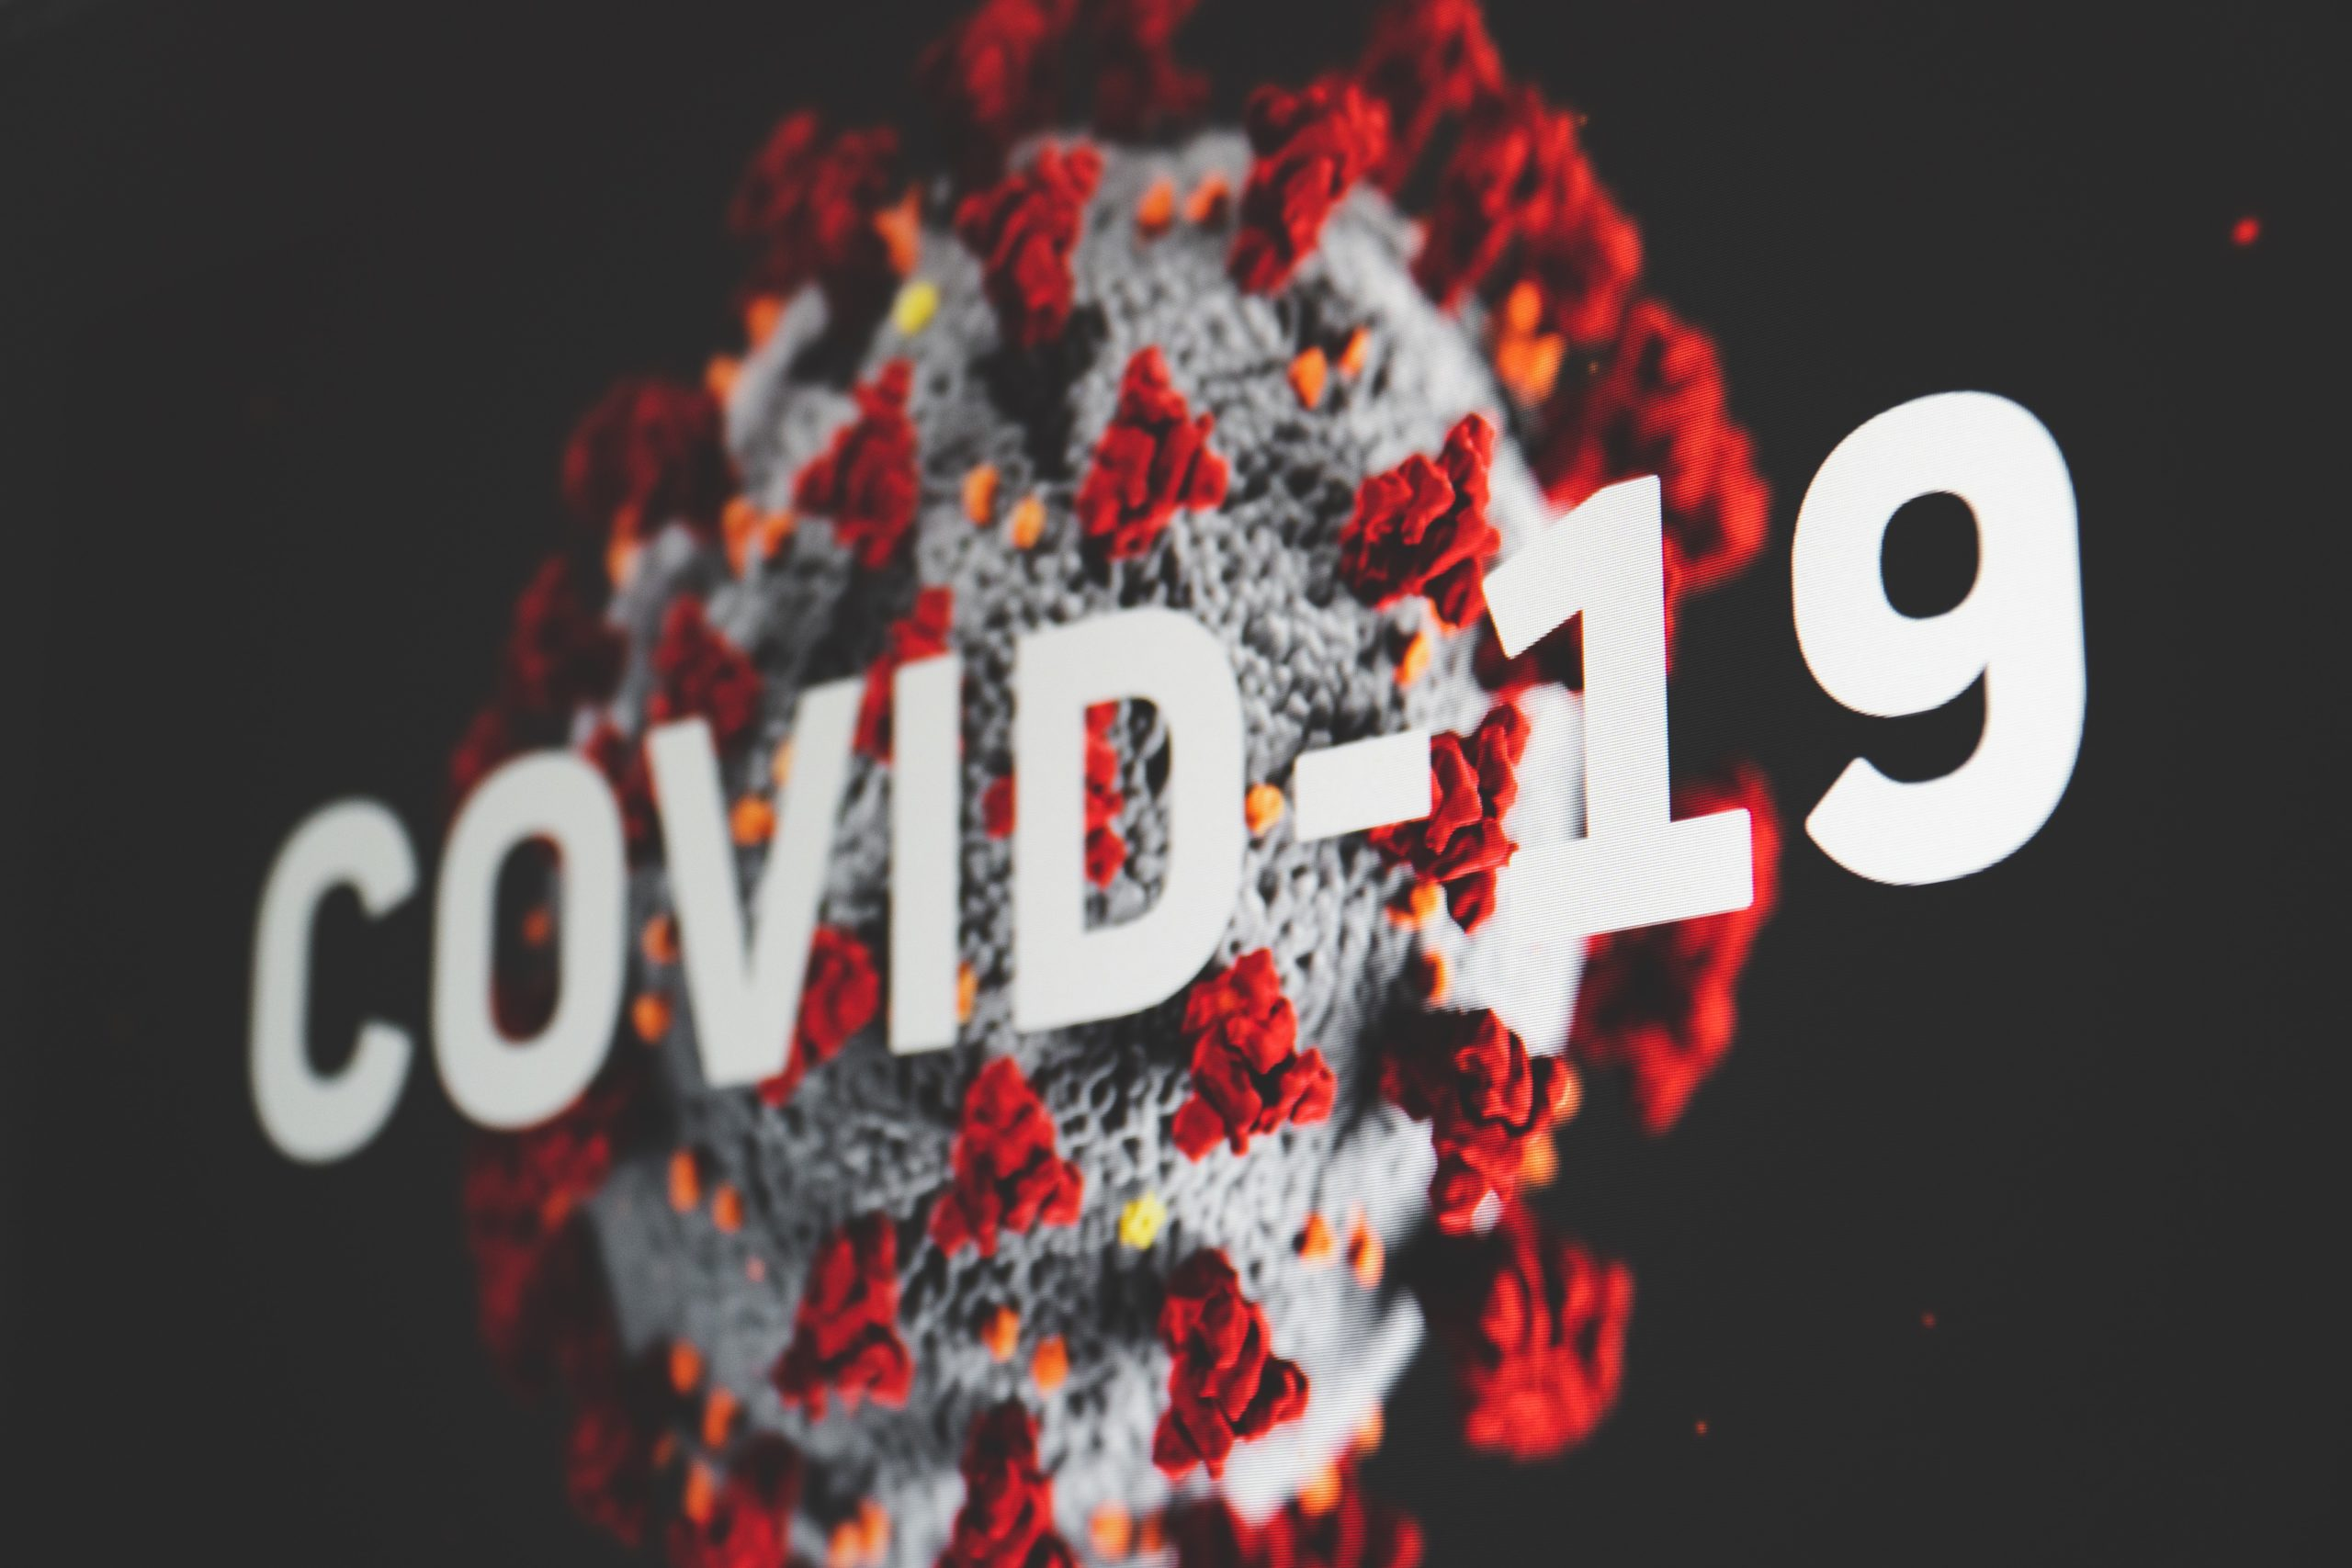 Epidemic, Pandemic, Outbreakの意味の違いと使い分け